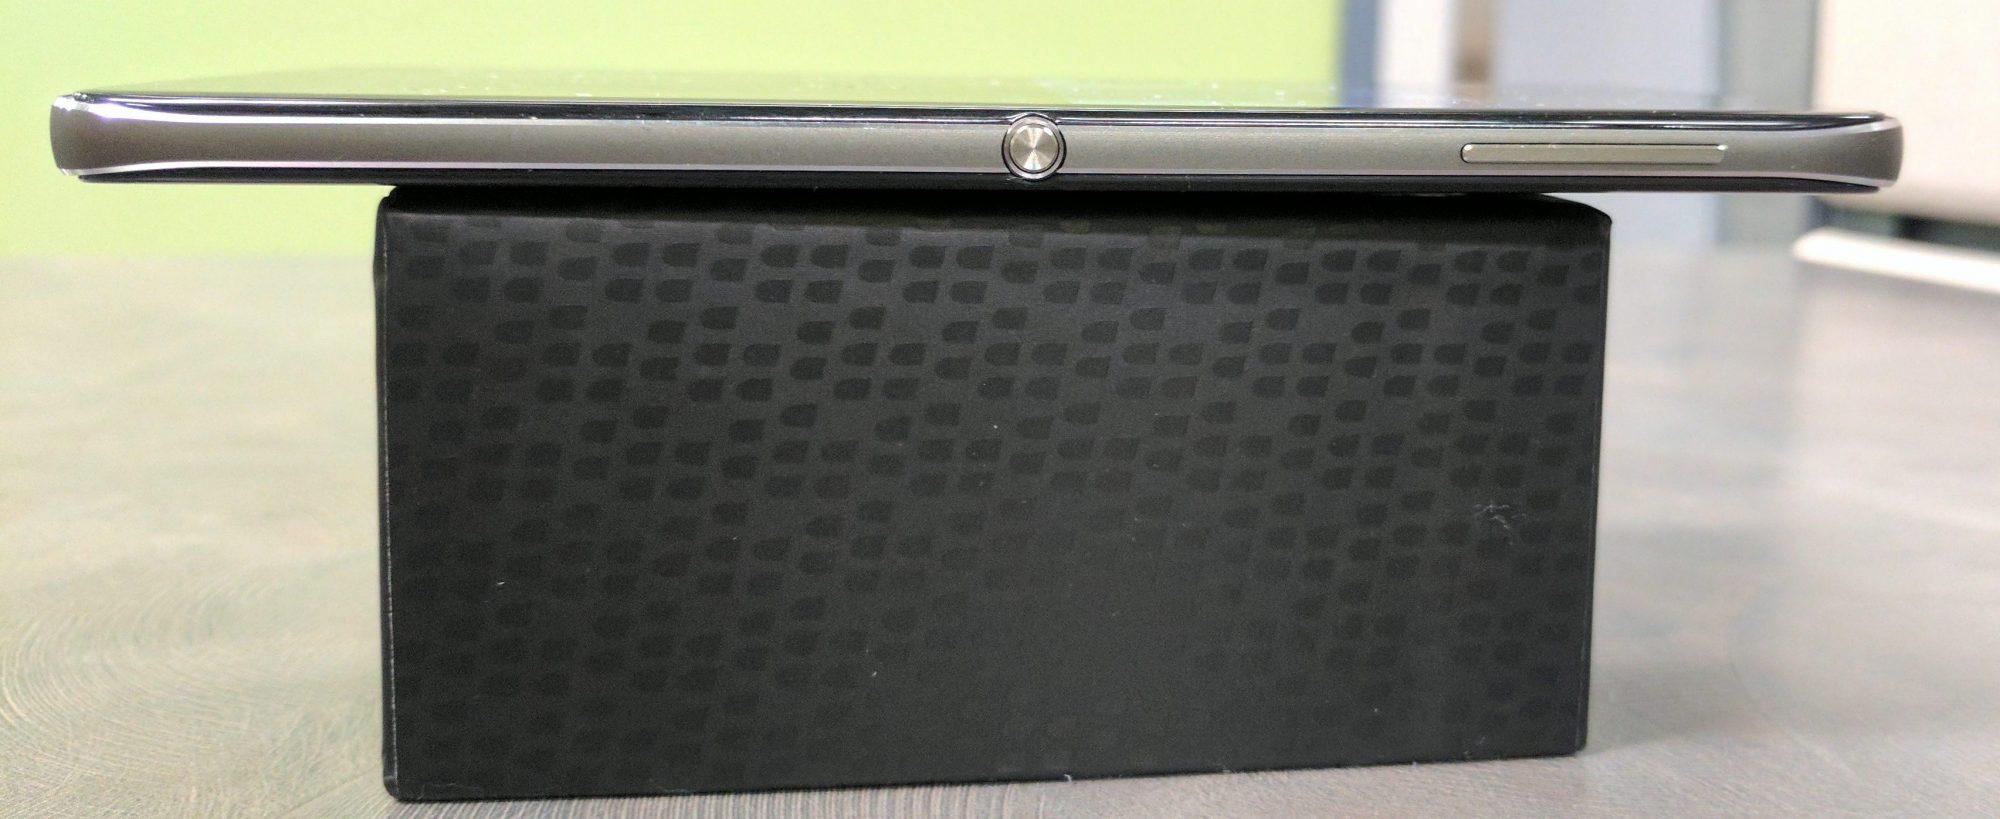 BlackBerry DTEK60 convenience key